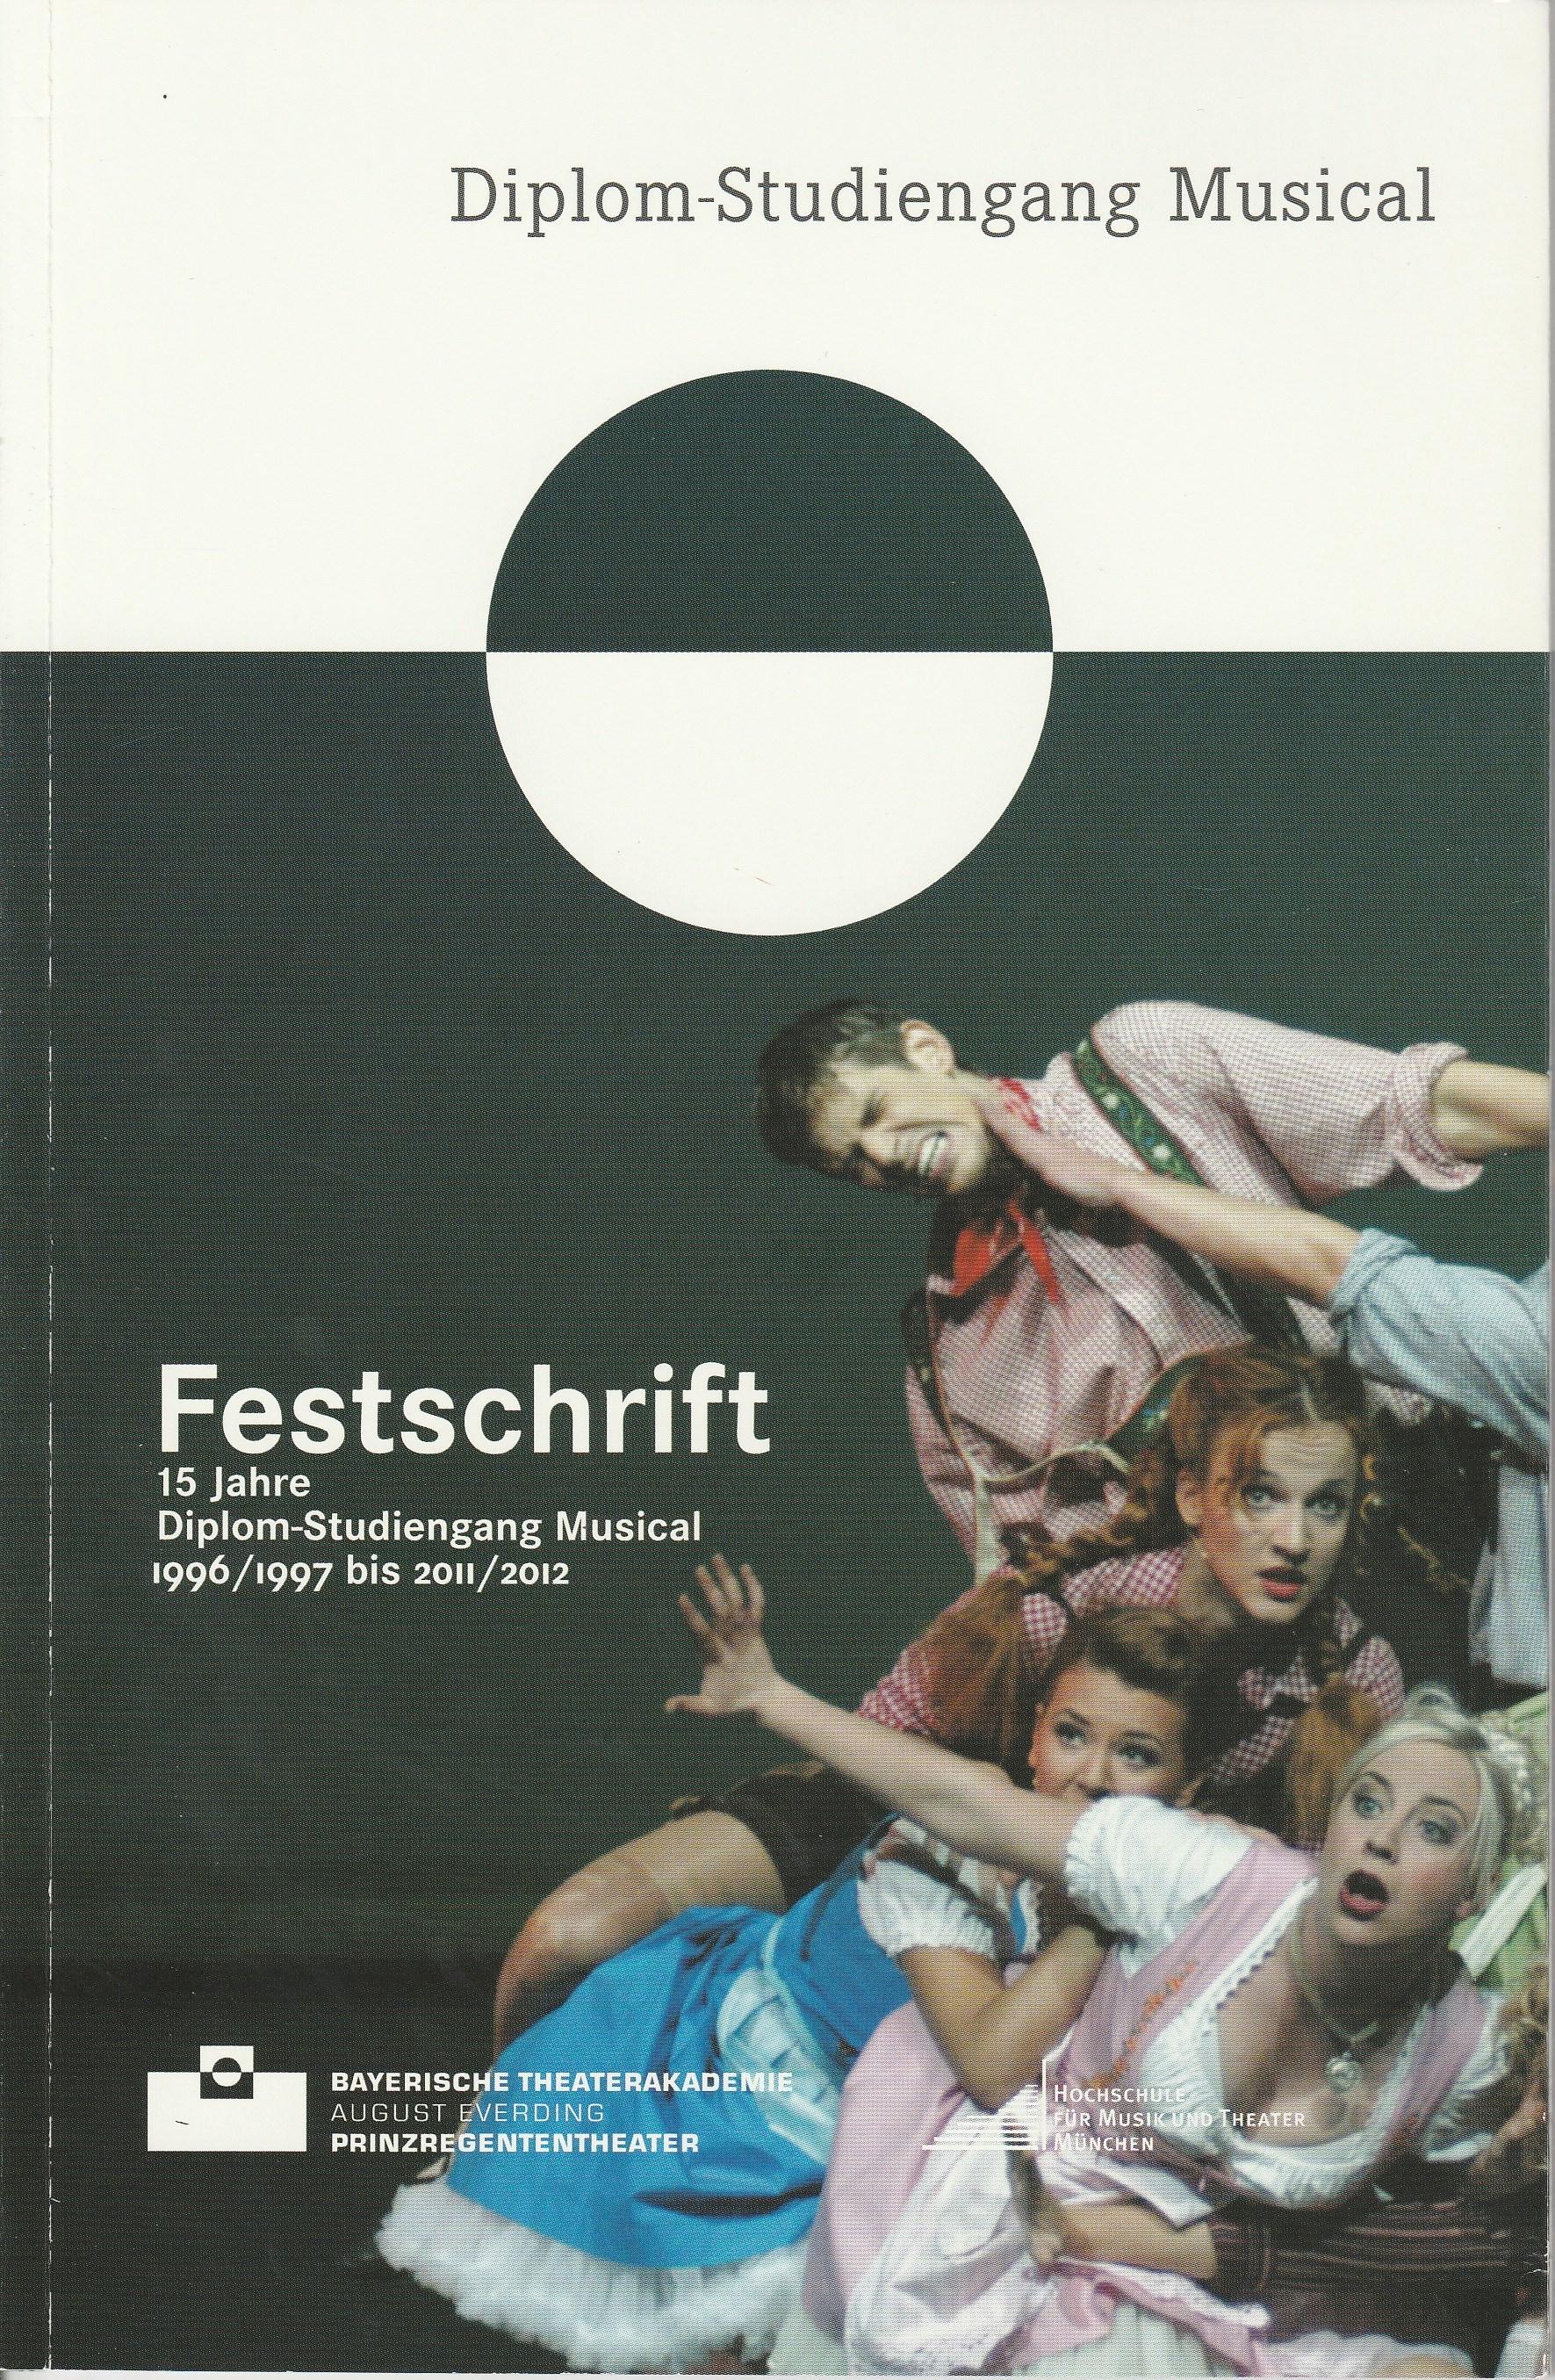 Festschrift 15 Jahre Diplom-Studiengang Musical Bayerische Theaterakademie